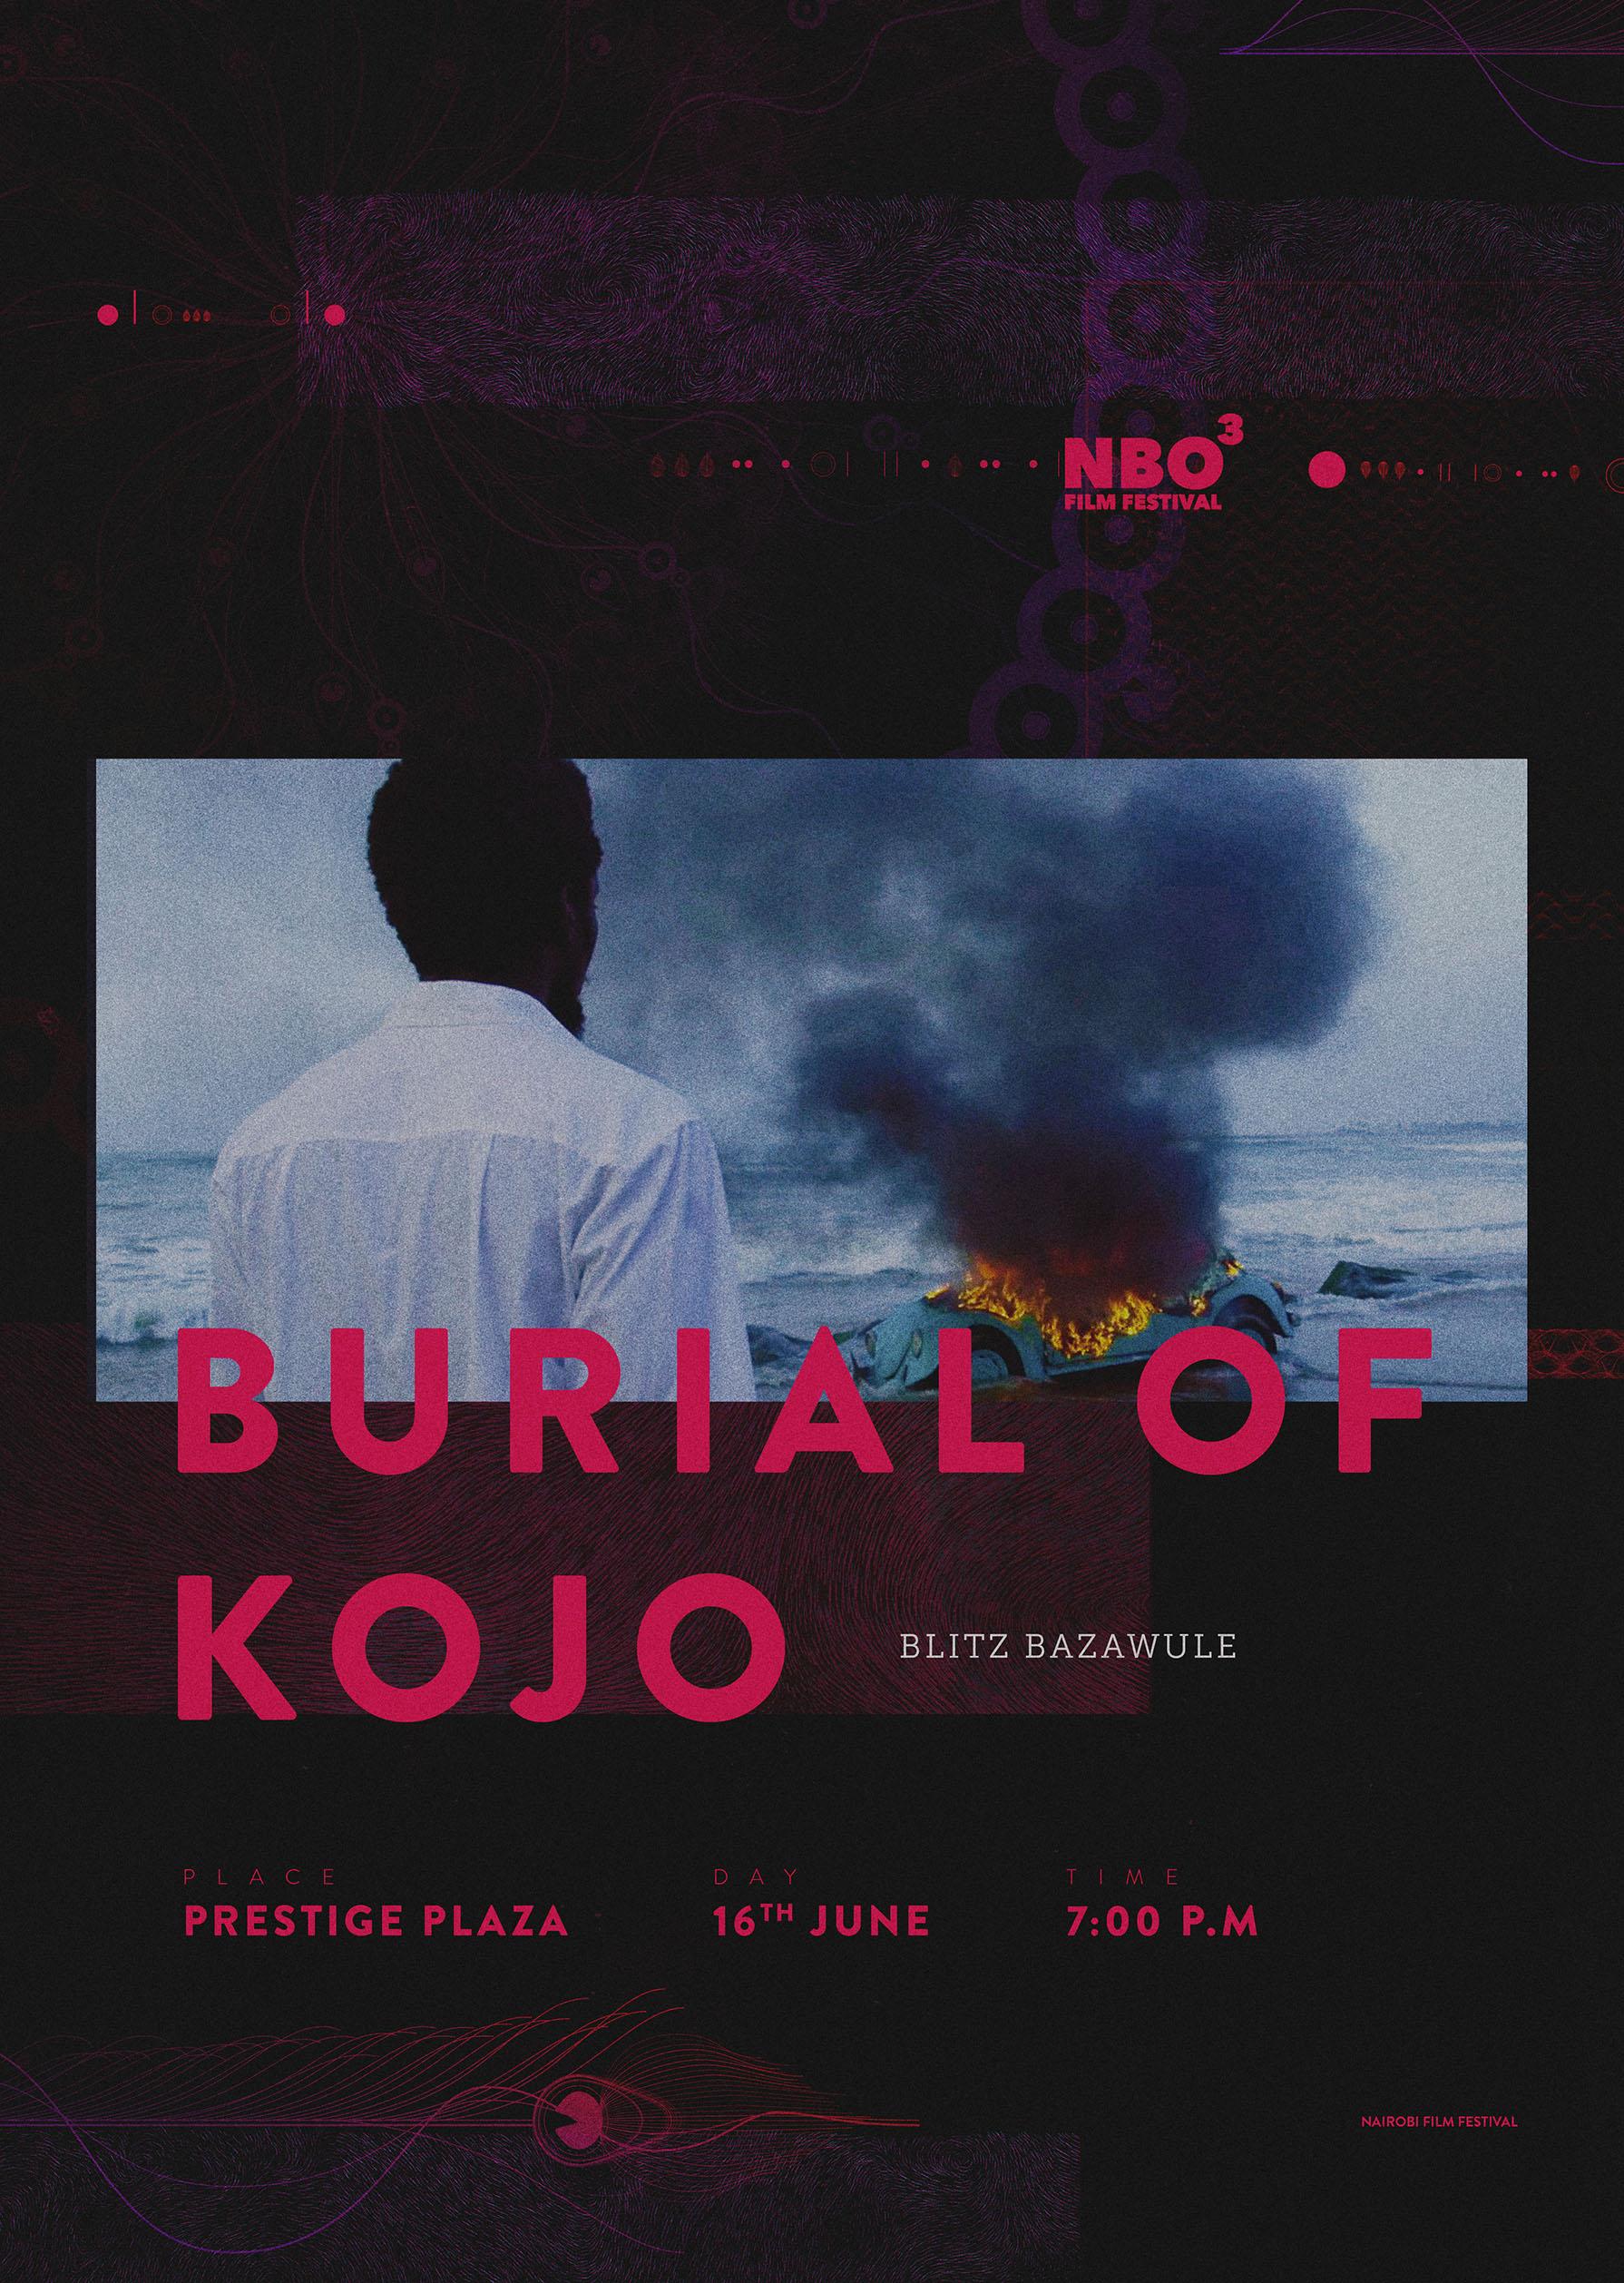 burial of kojo A3 jpeg.jpg